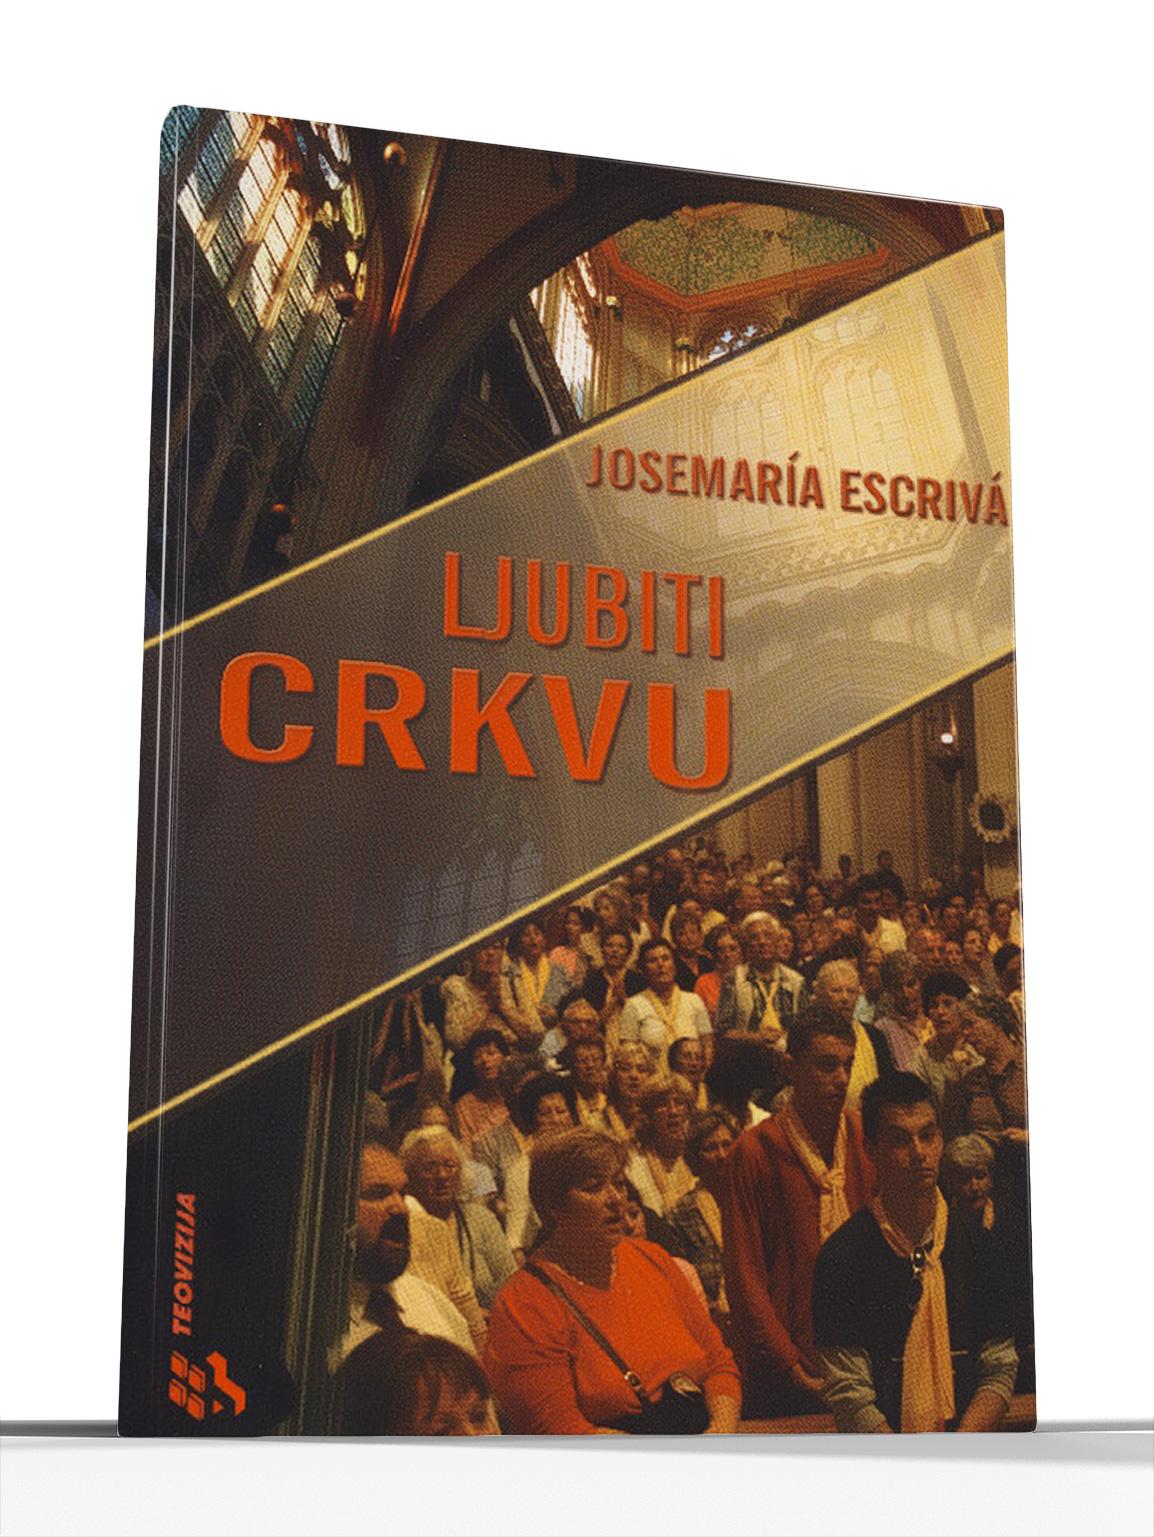 LJUBITI CRKVU - Josemaría Escrivá